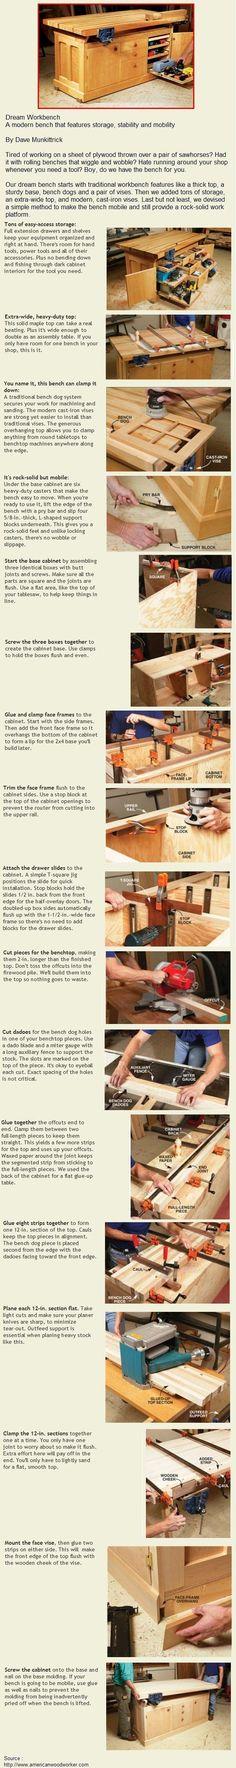 Dream Workbench   WoodworkerZ.com